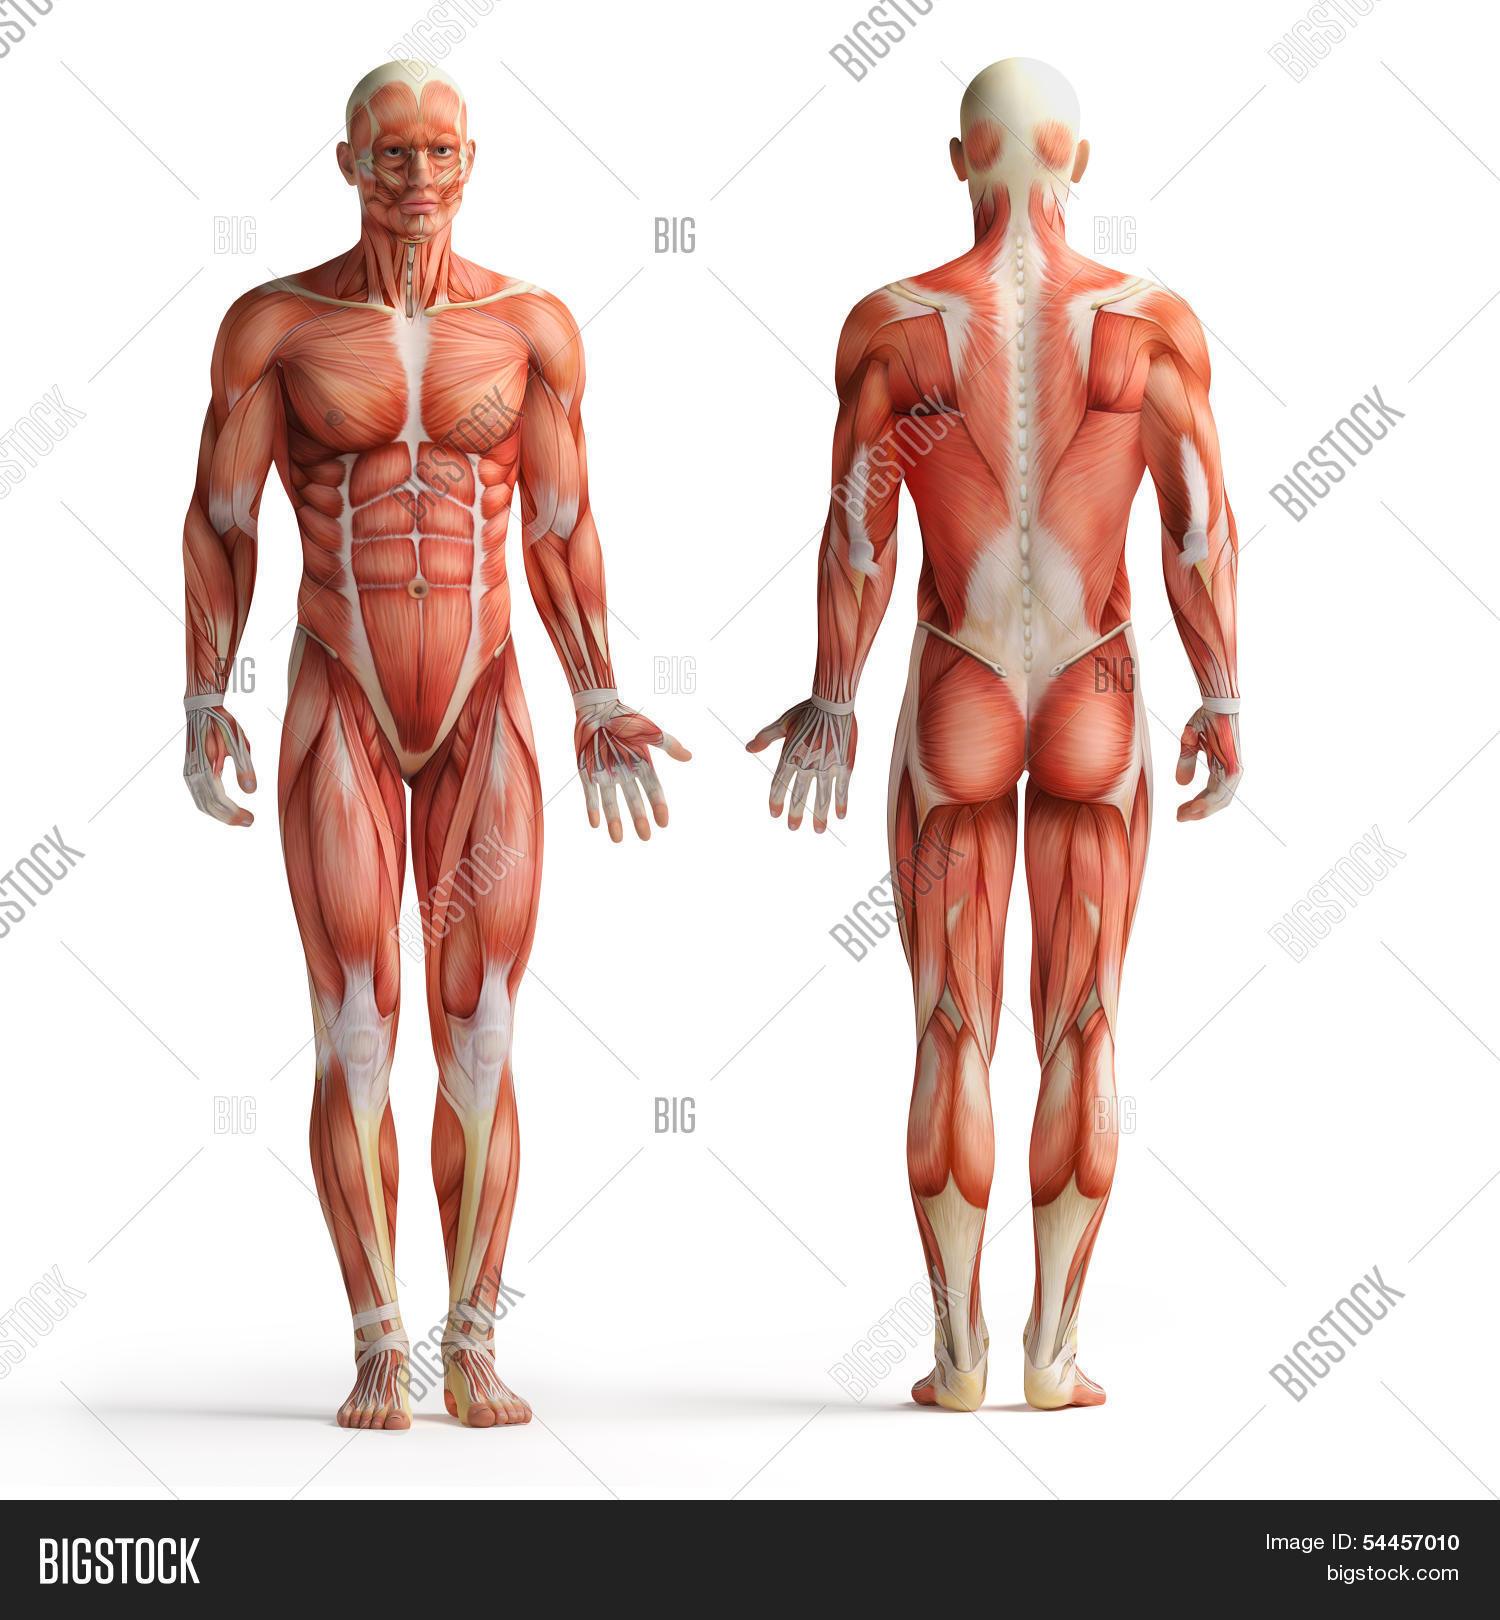 Human Anatomy View Image Photo Free Trial Bigstock